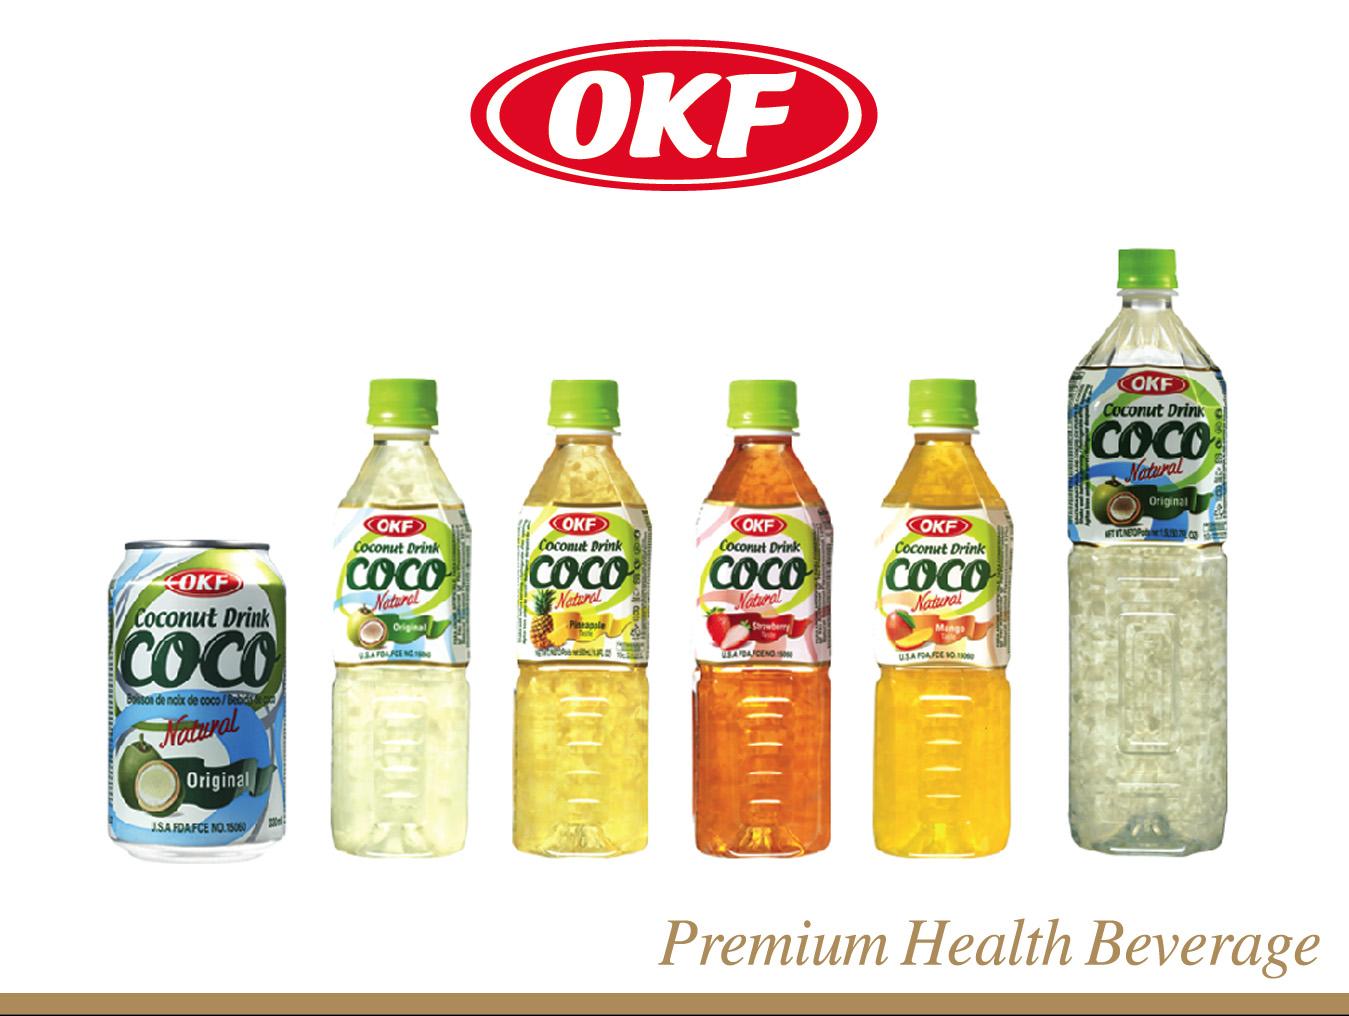 OKF Coco (Health Drink) - OKF Corp.: okfcorp.en.ecplaza.net/okf-coco-health-drink---72047-1378363.html